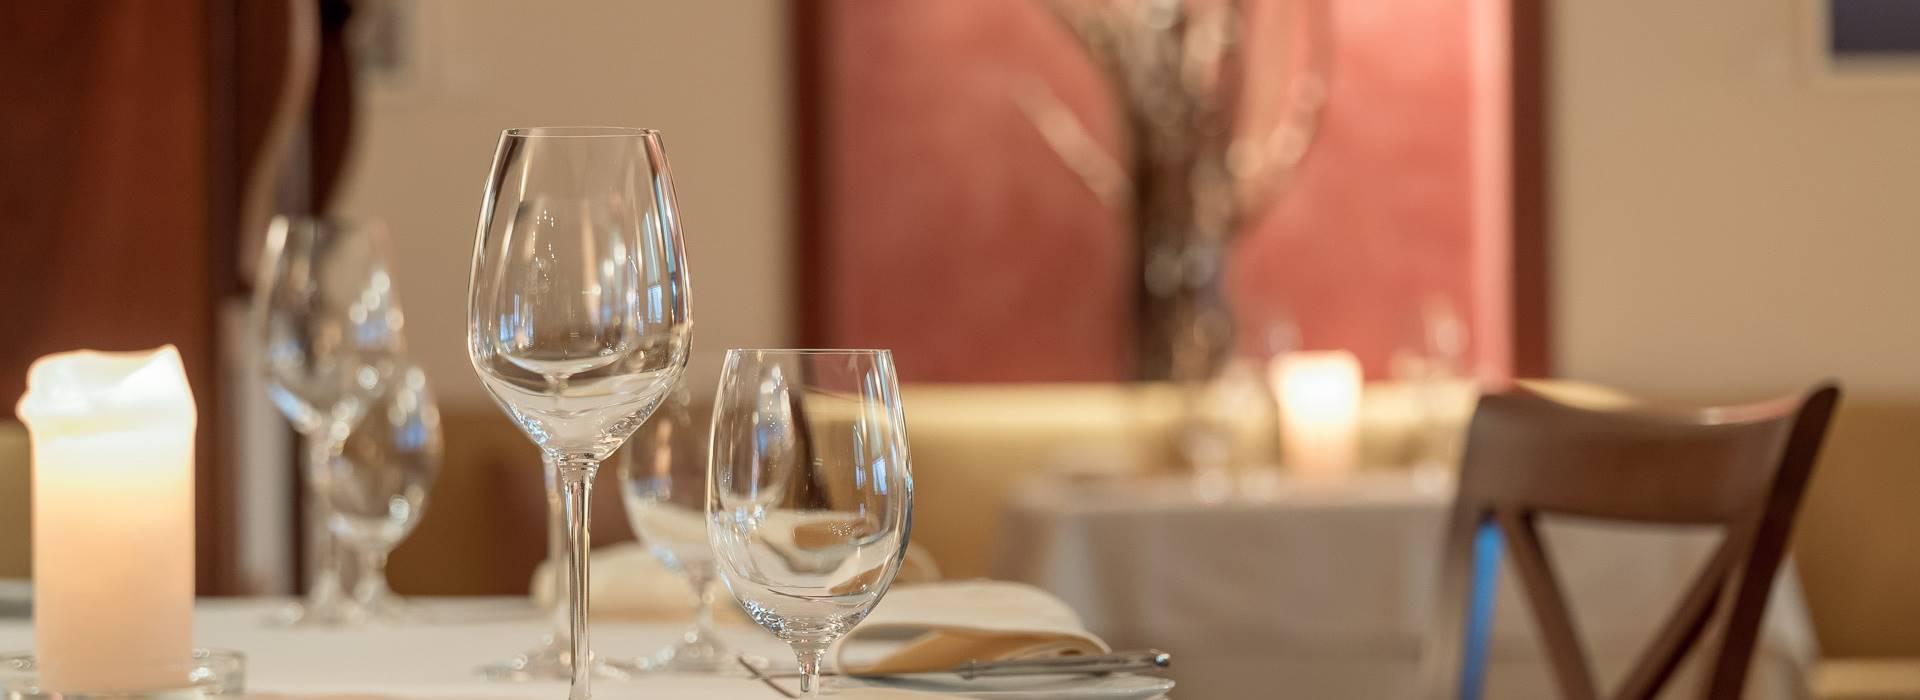 seehotel-lackner-restaurant-5